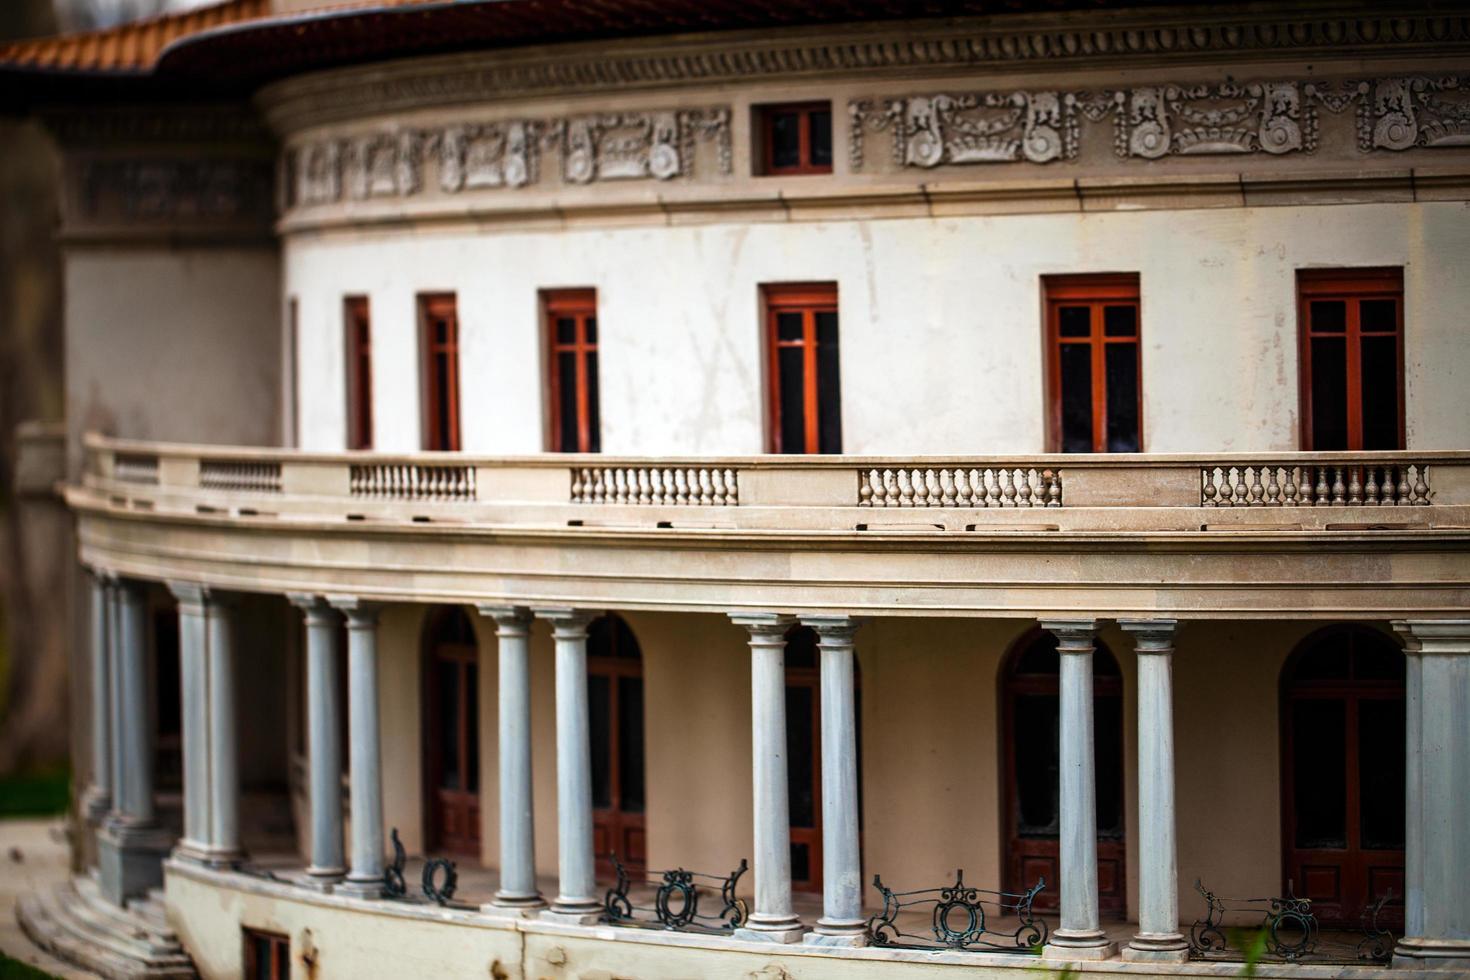 Model Art of Historical Building photo